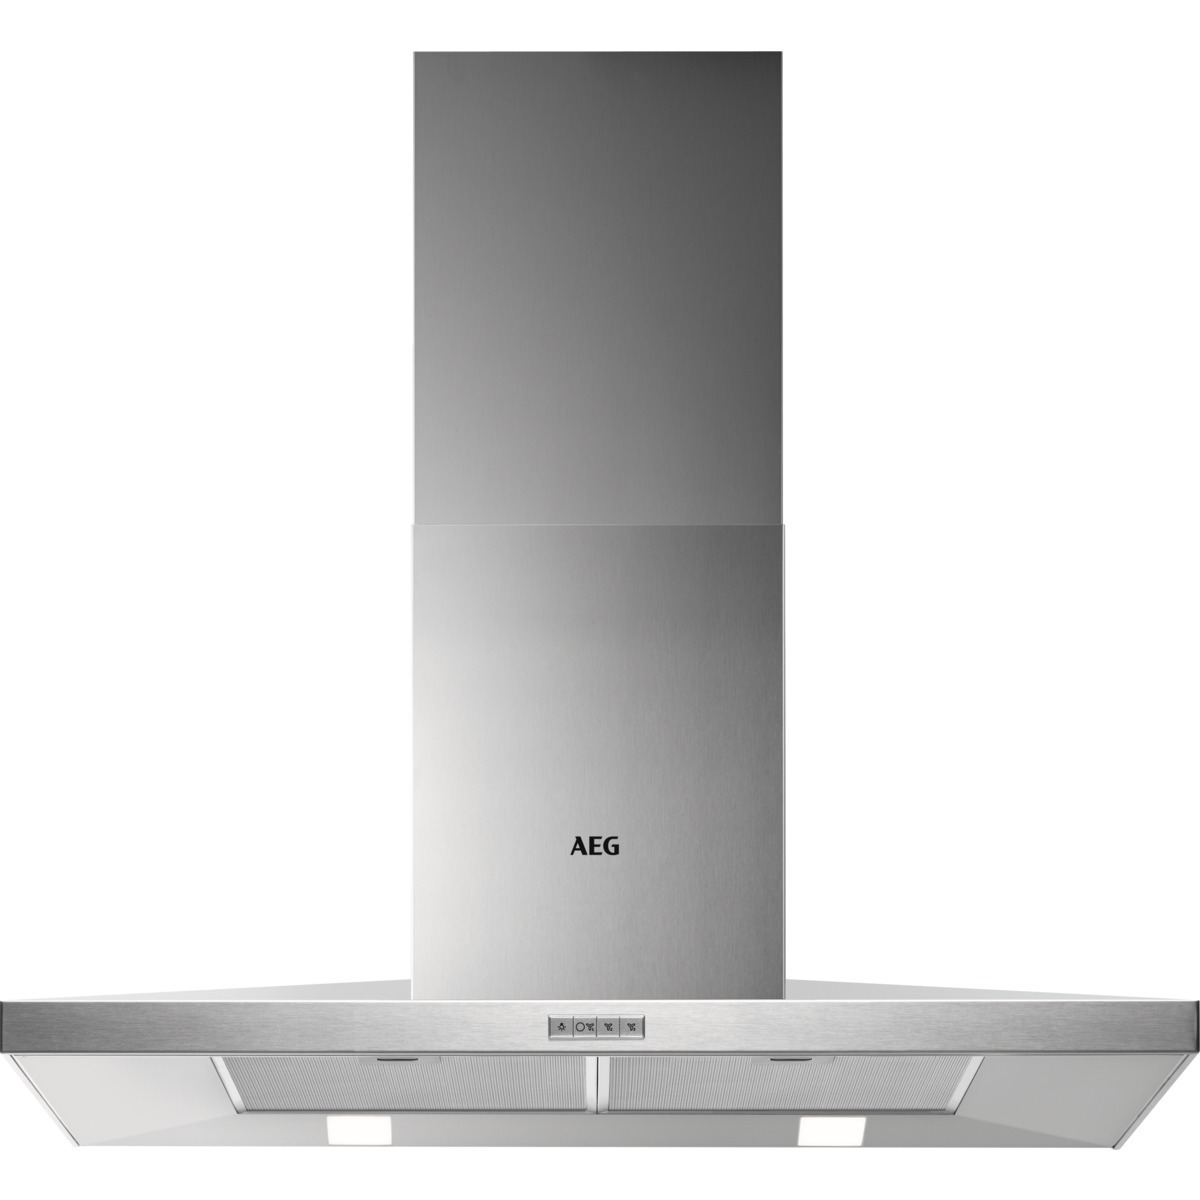 AEG DKB4950M Schouwkap Staal